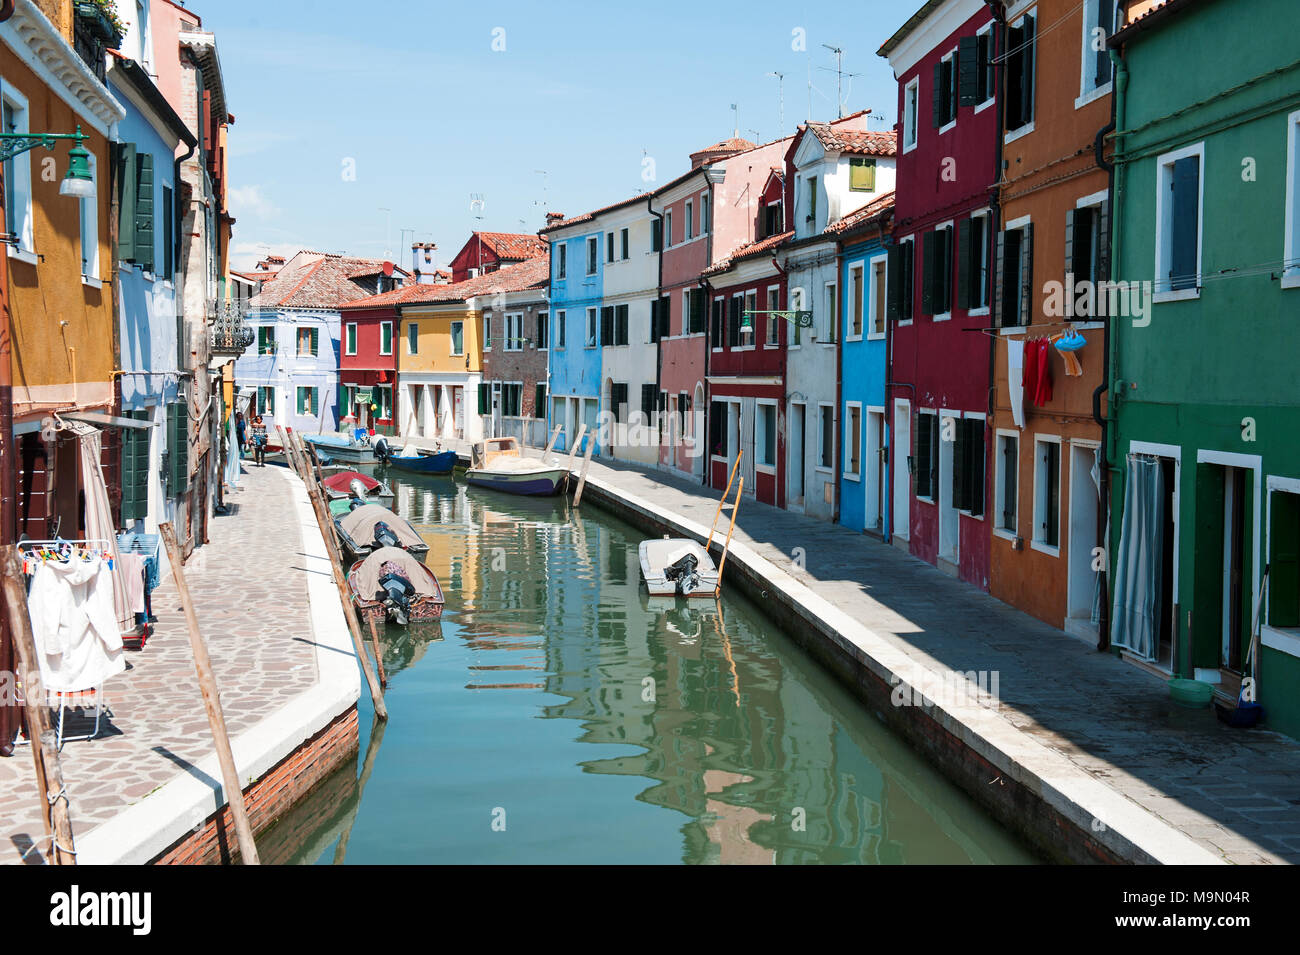 BURANO, Venedig, Italien - 16 April, 2017: Blick über den Kanal und hell bunte Häuser an einem sonnigen Tag Stockbild